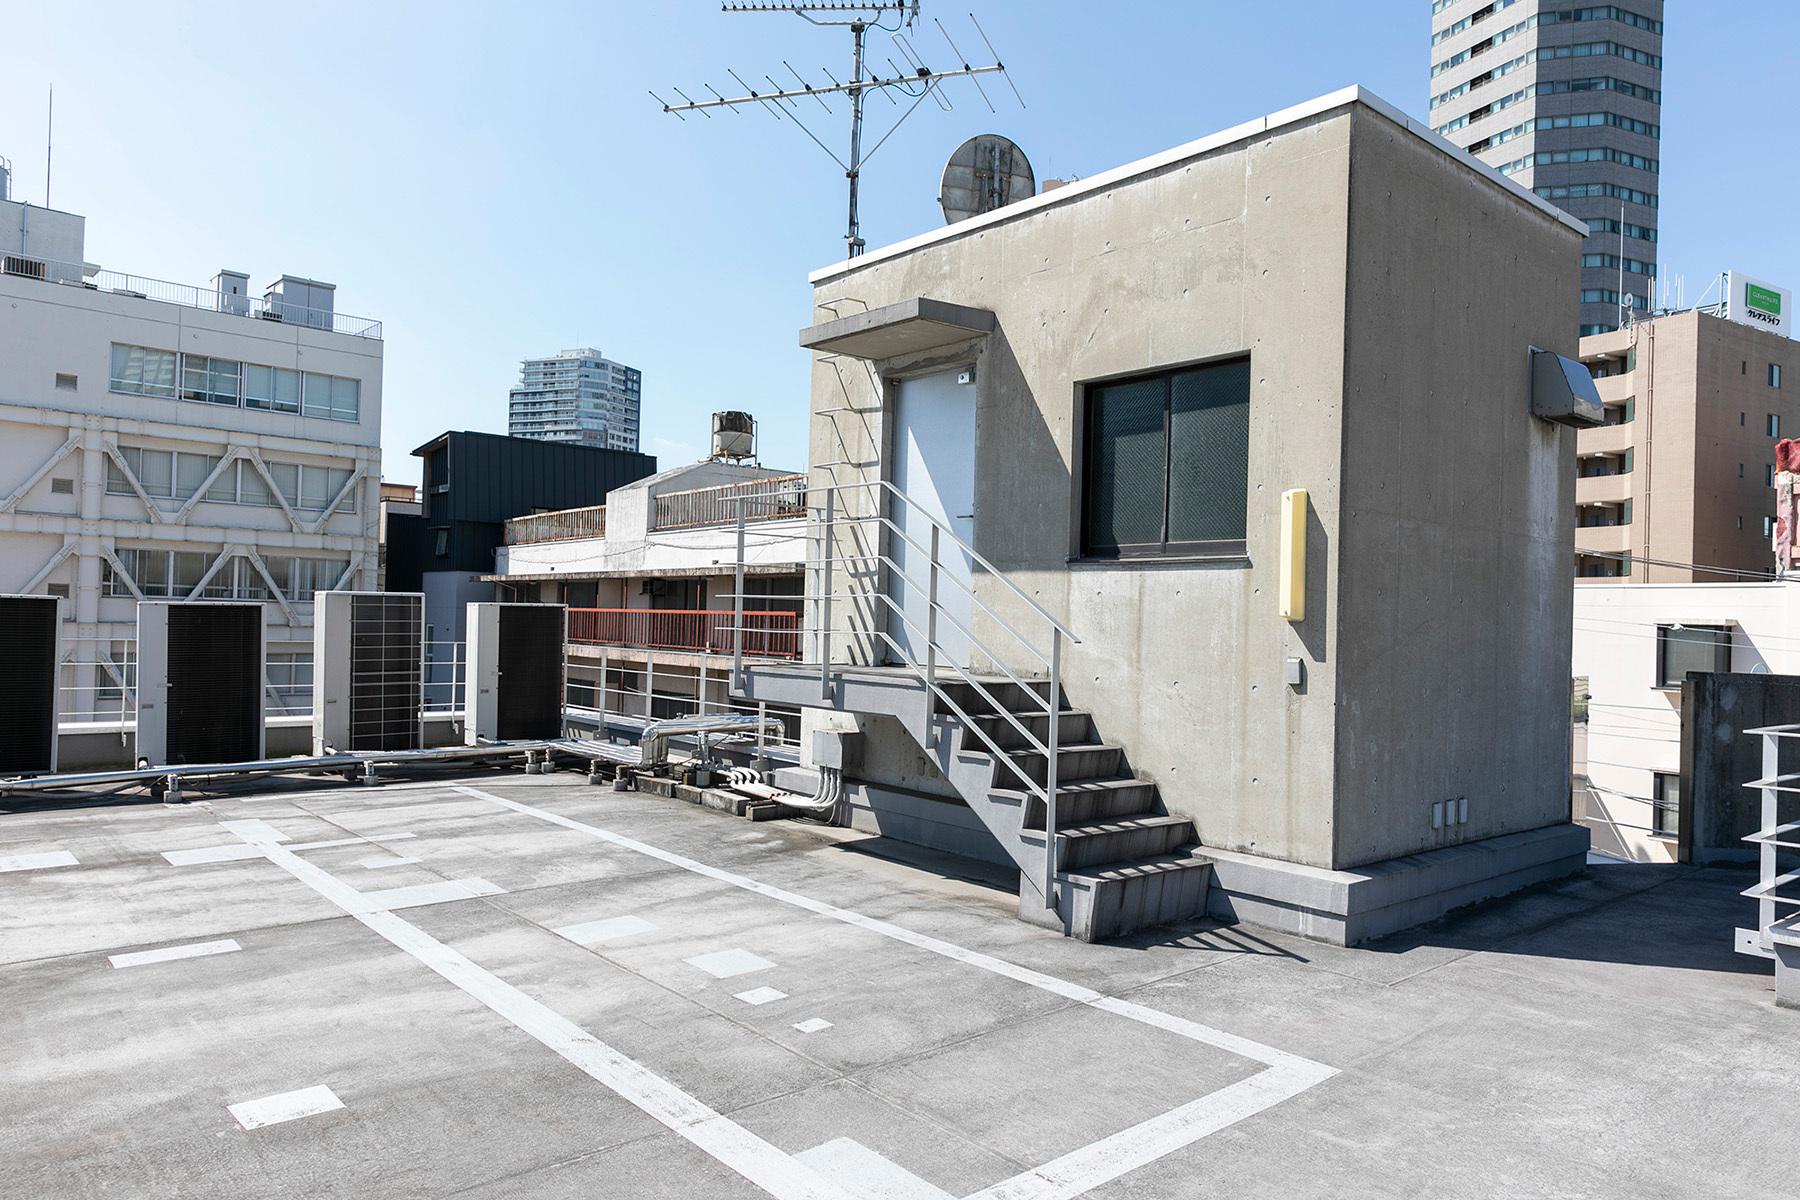 studio Mired(スタジオ ミレッド)パネル変更可能 淡い色合い